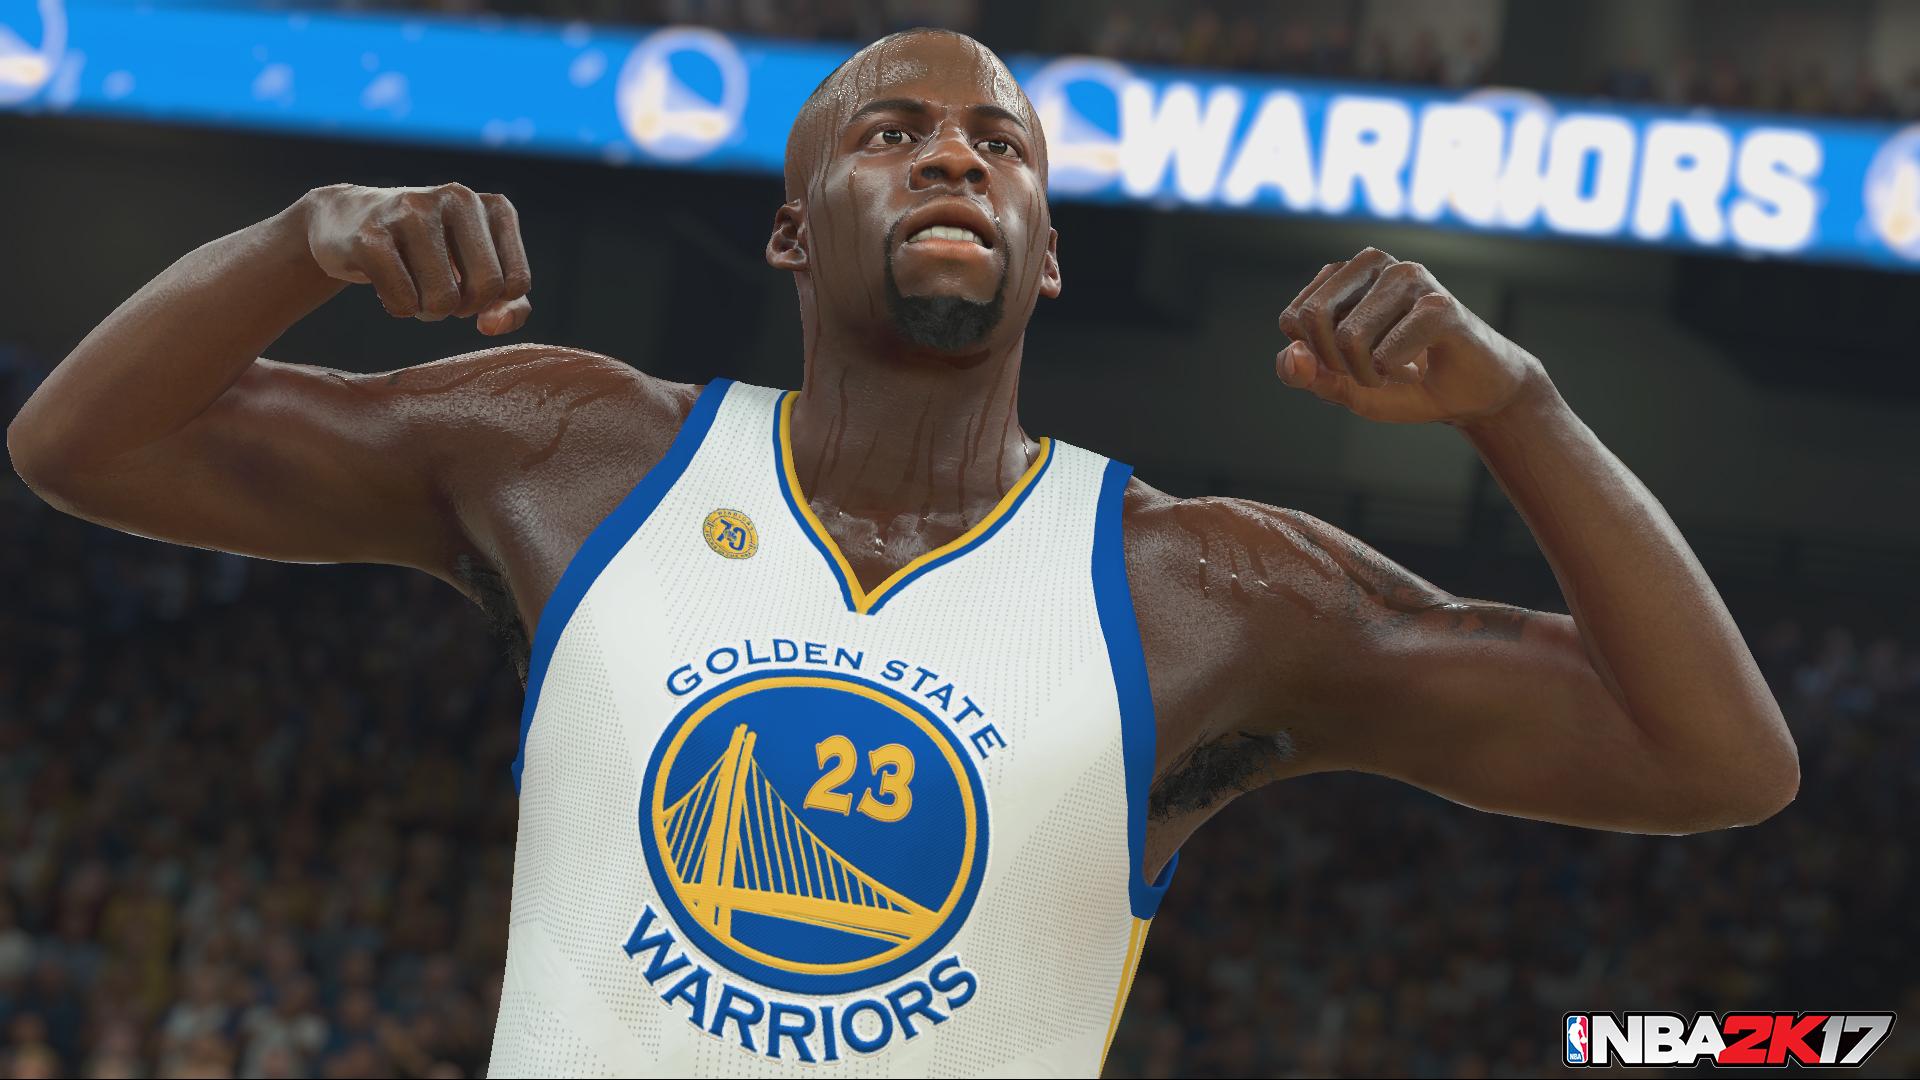 《NBA 2K17》NBA球迷的狂欢节11